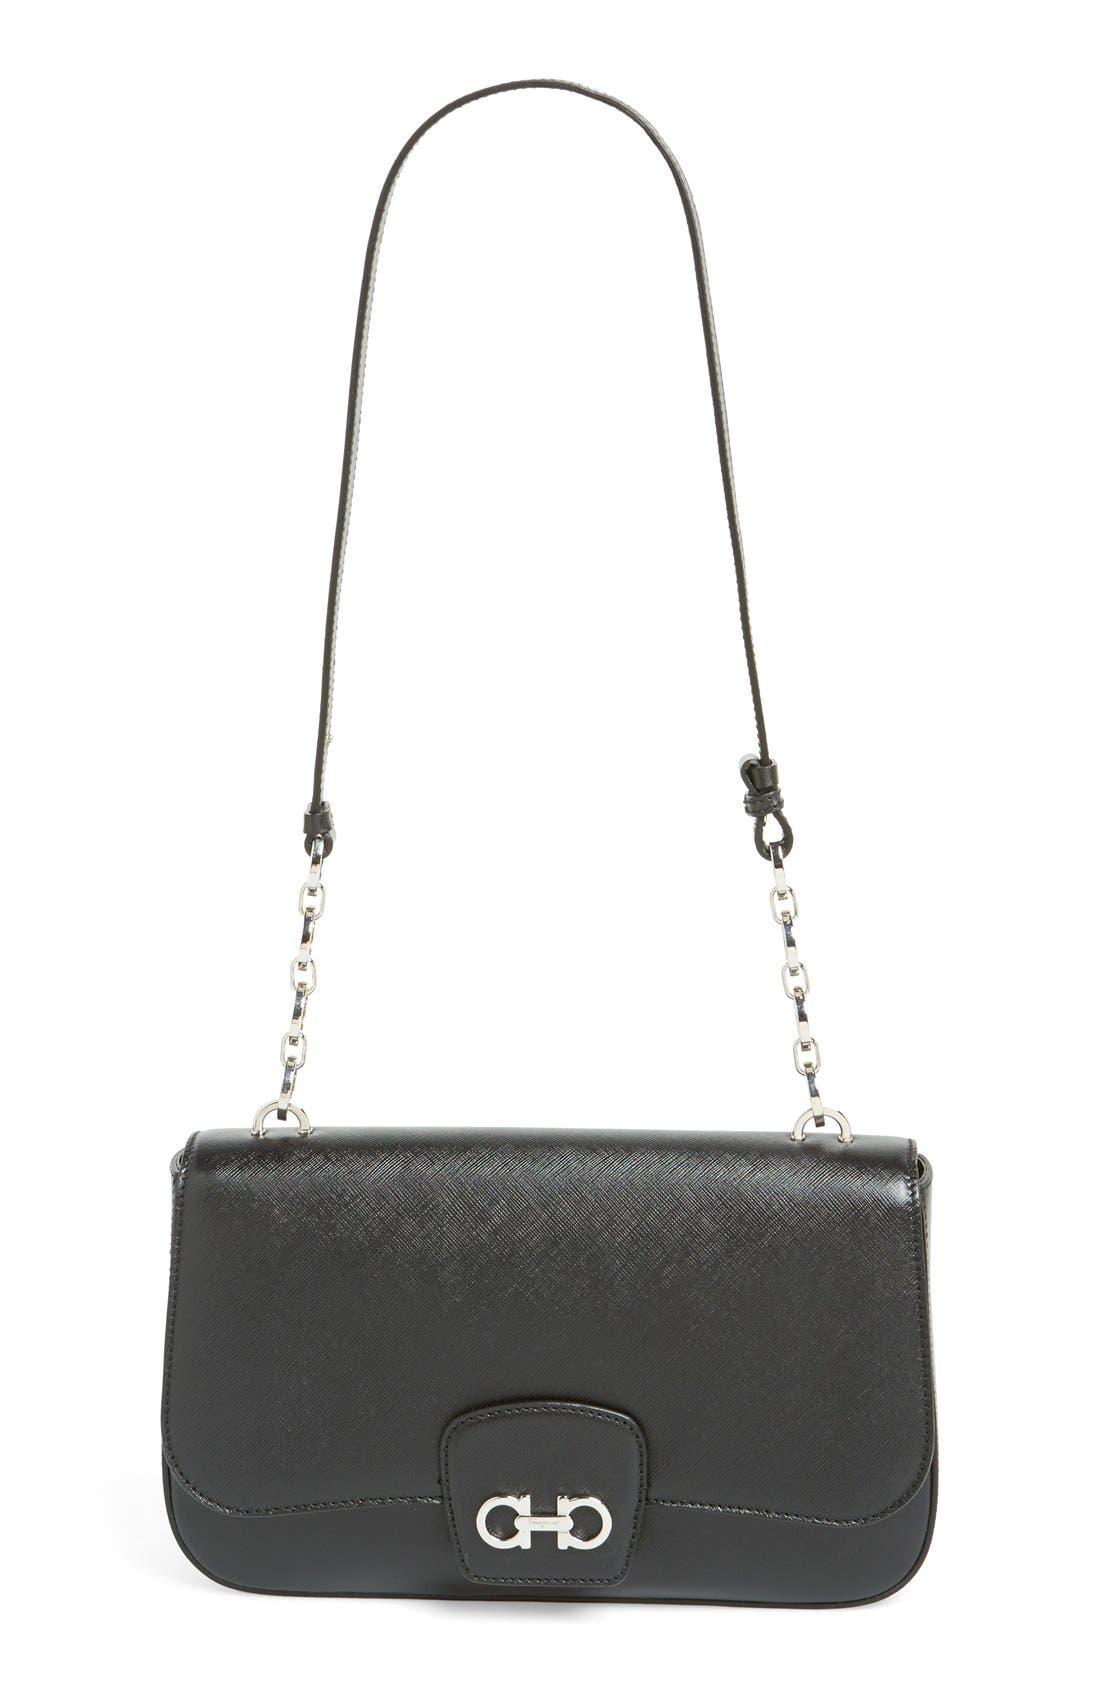 Alternate Image 1 Selected - Salvatore Ferragamo 'Bree' Shoulder Bag